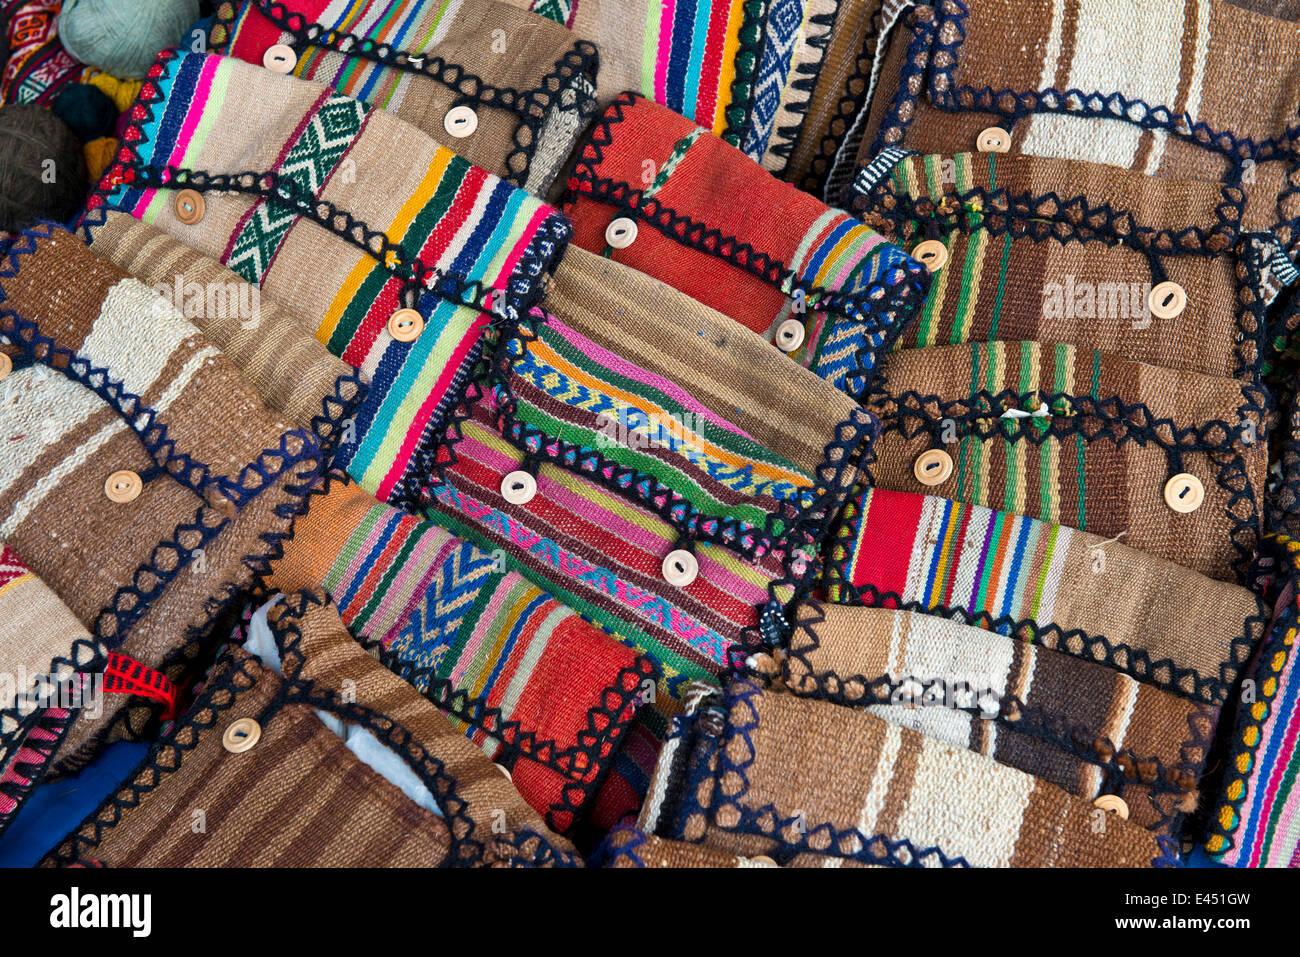 Traditional Handbag Stockfotos & Traditional Handbag Bilder - Alamy